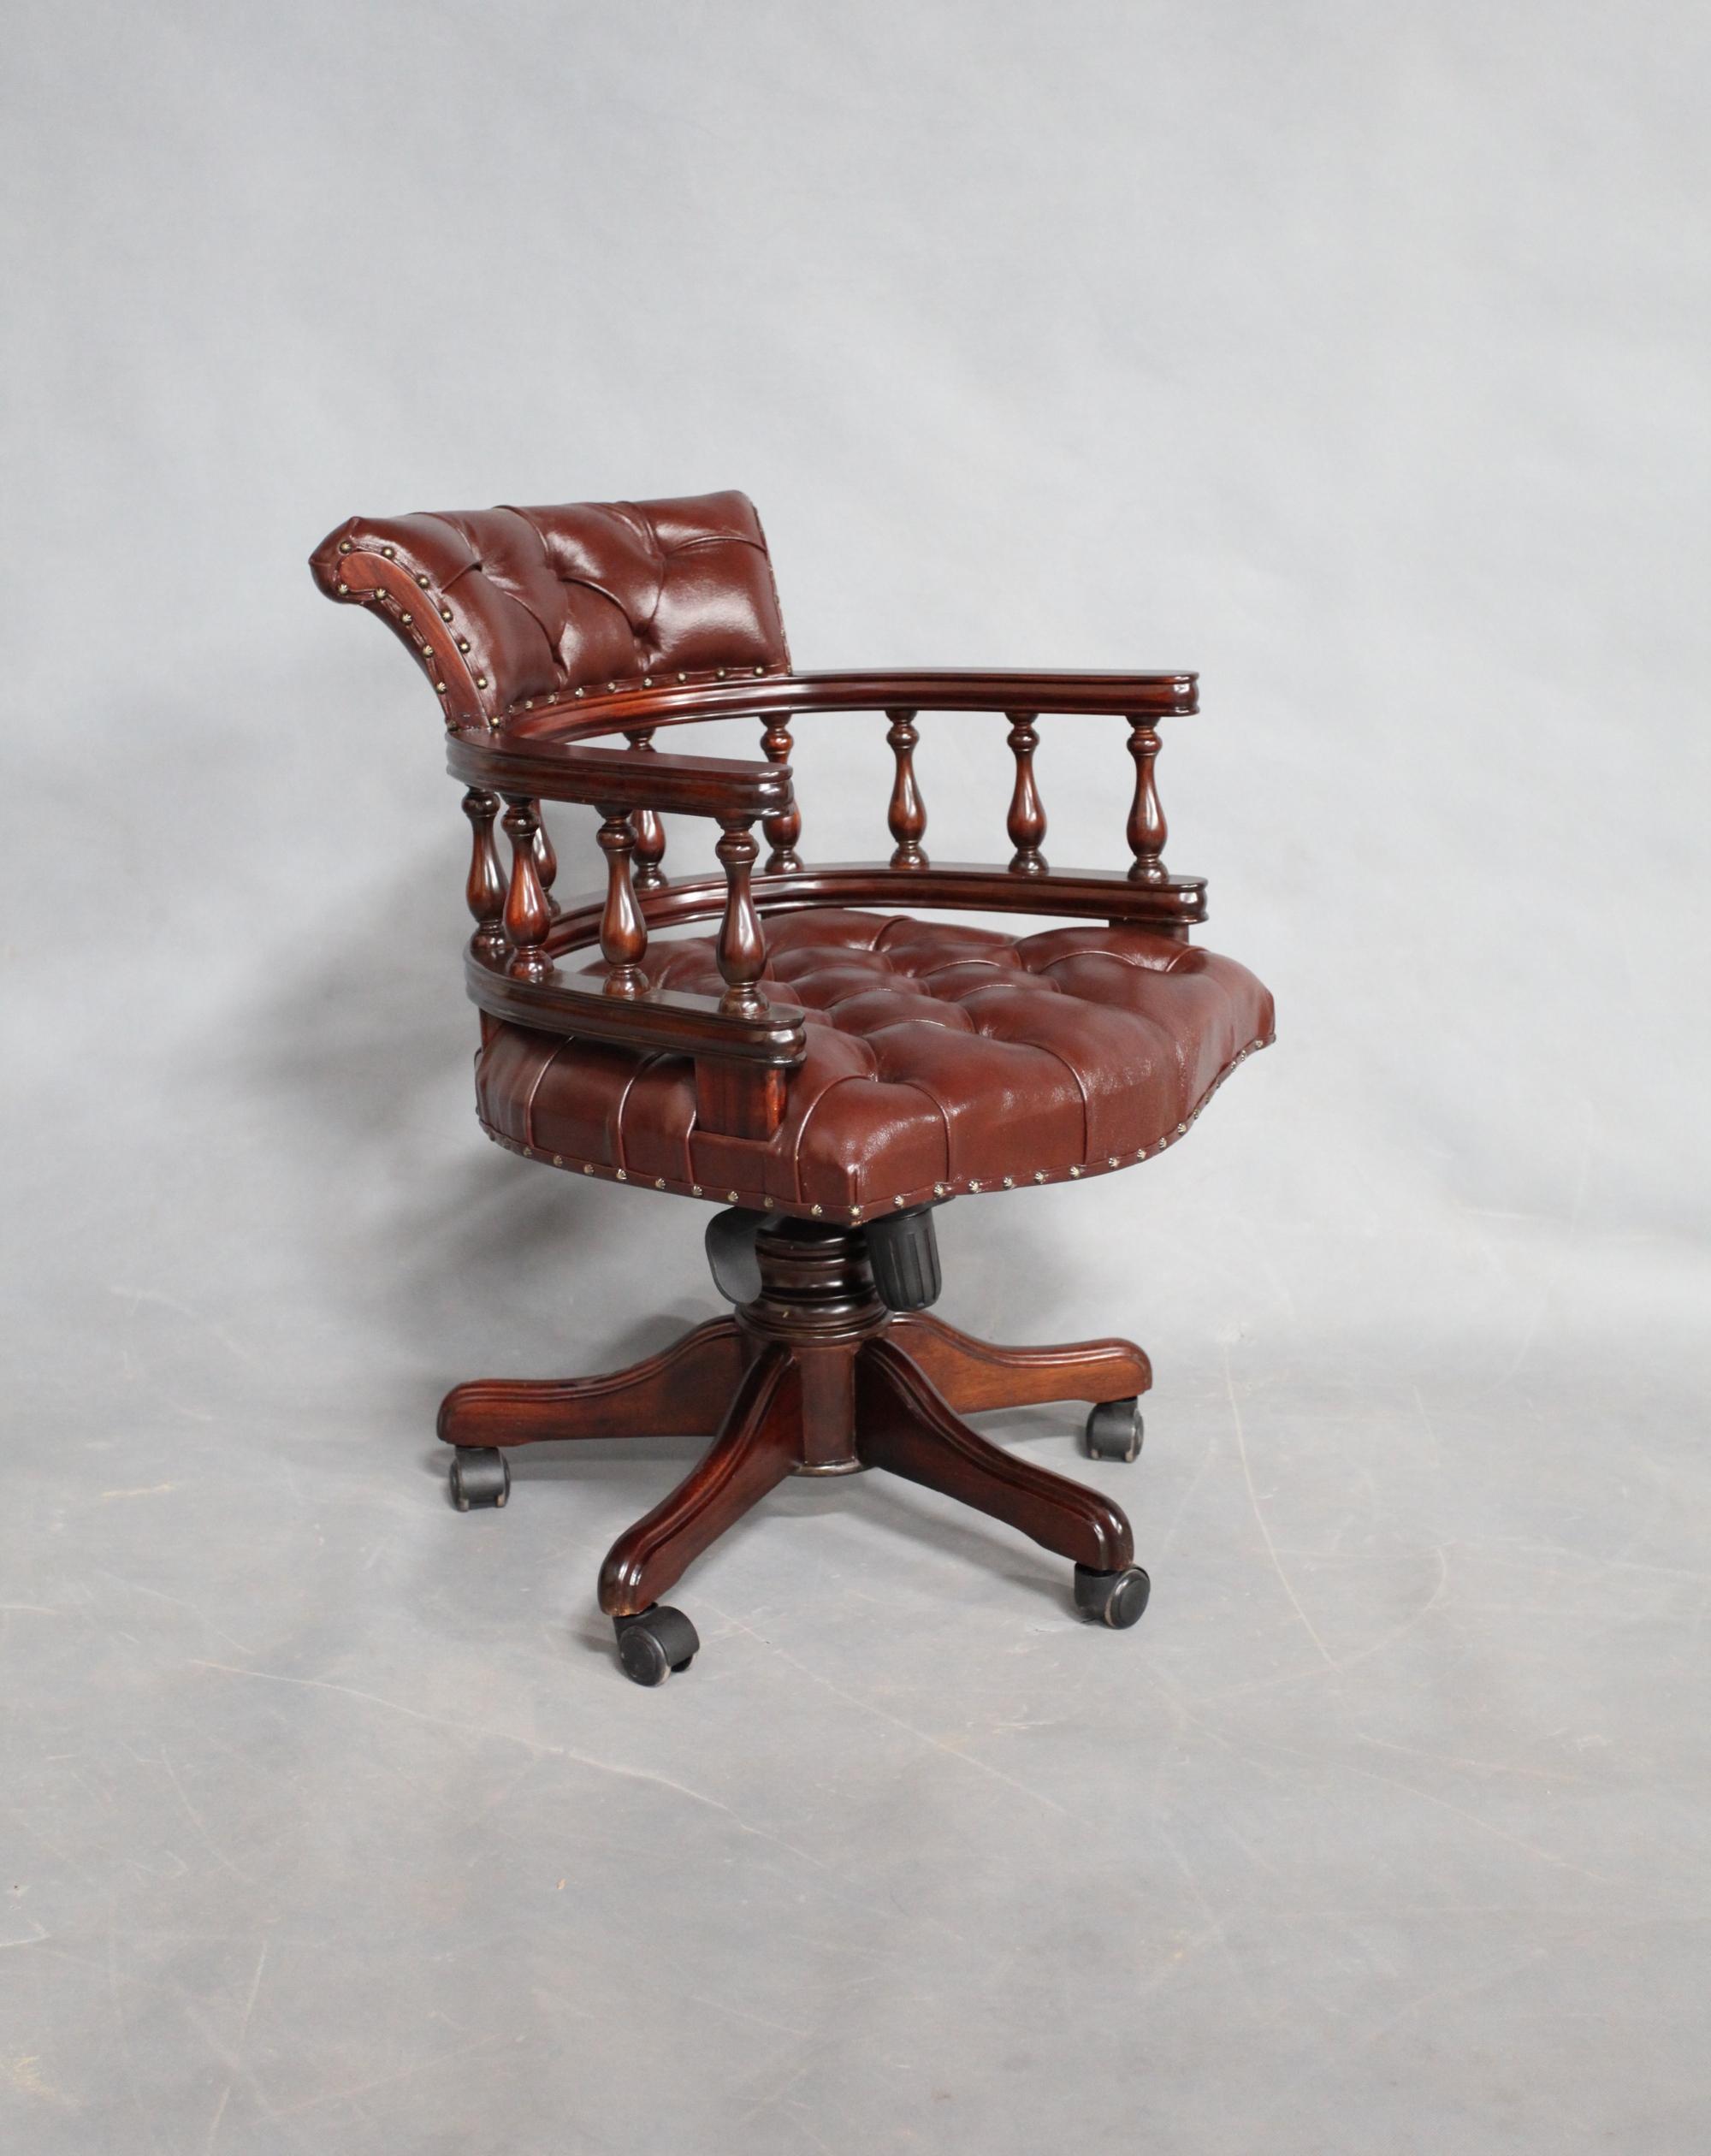 Sensational Solid Mahogany Wood Captains Swivel Office Chair Machost Co Dining Chair Design Ideas Machostcouk